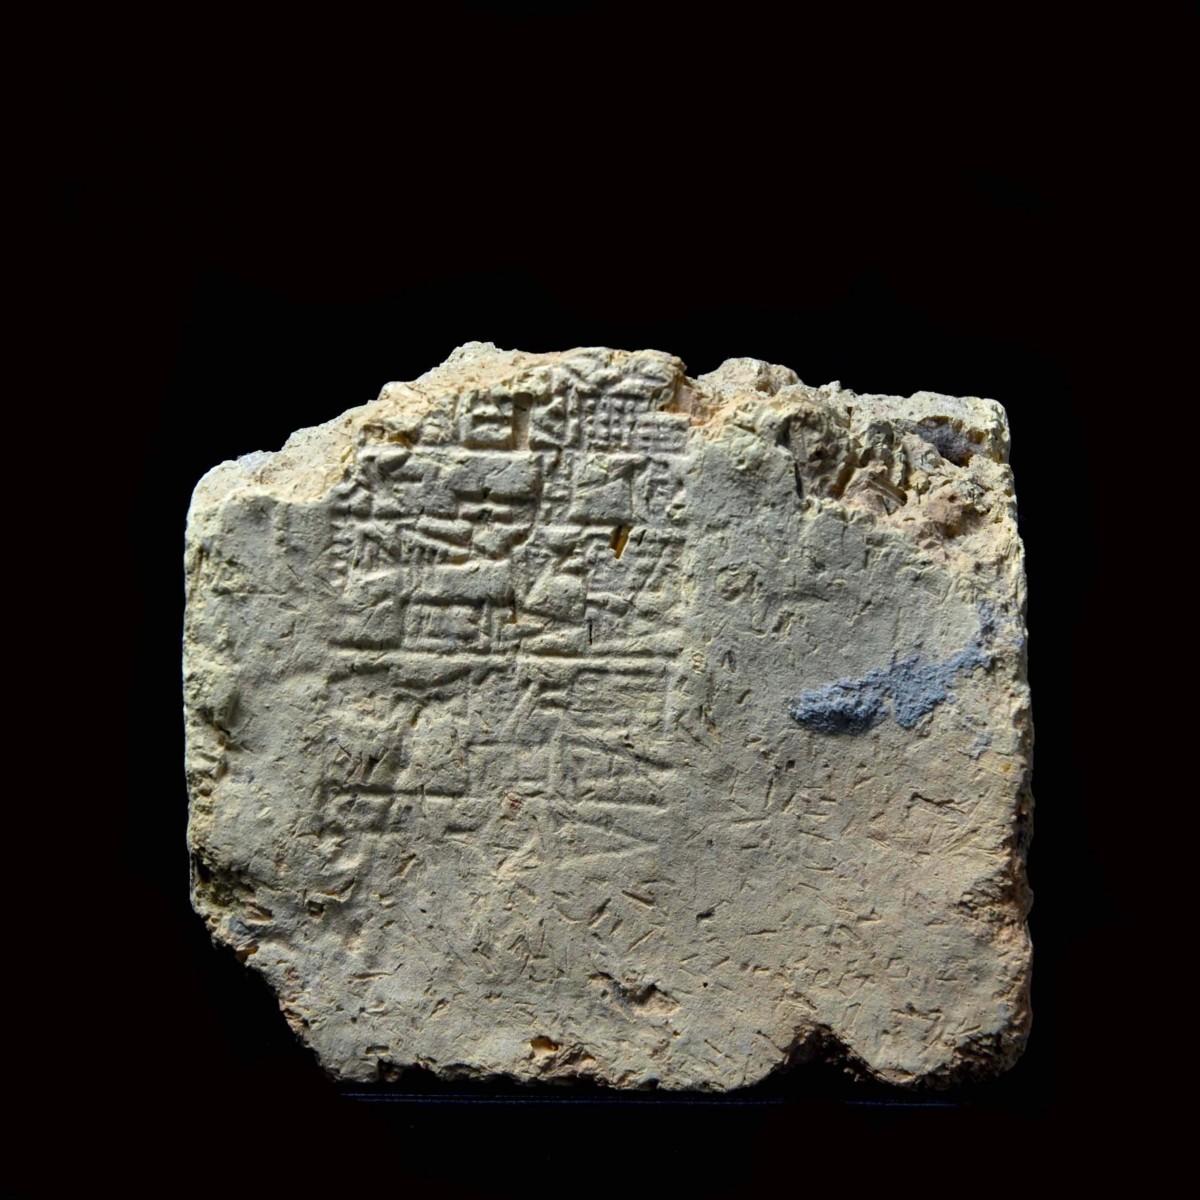 Fragment of a sumerian cuneiform brick of Amar-Sin